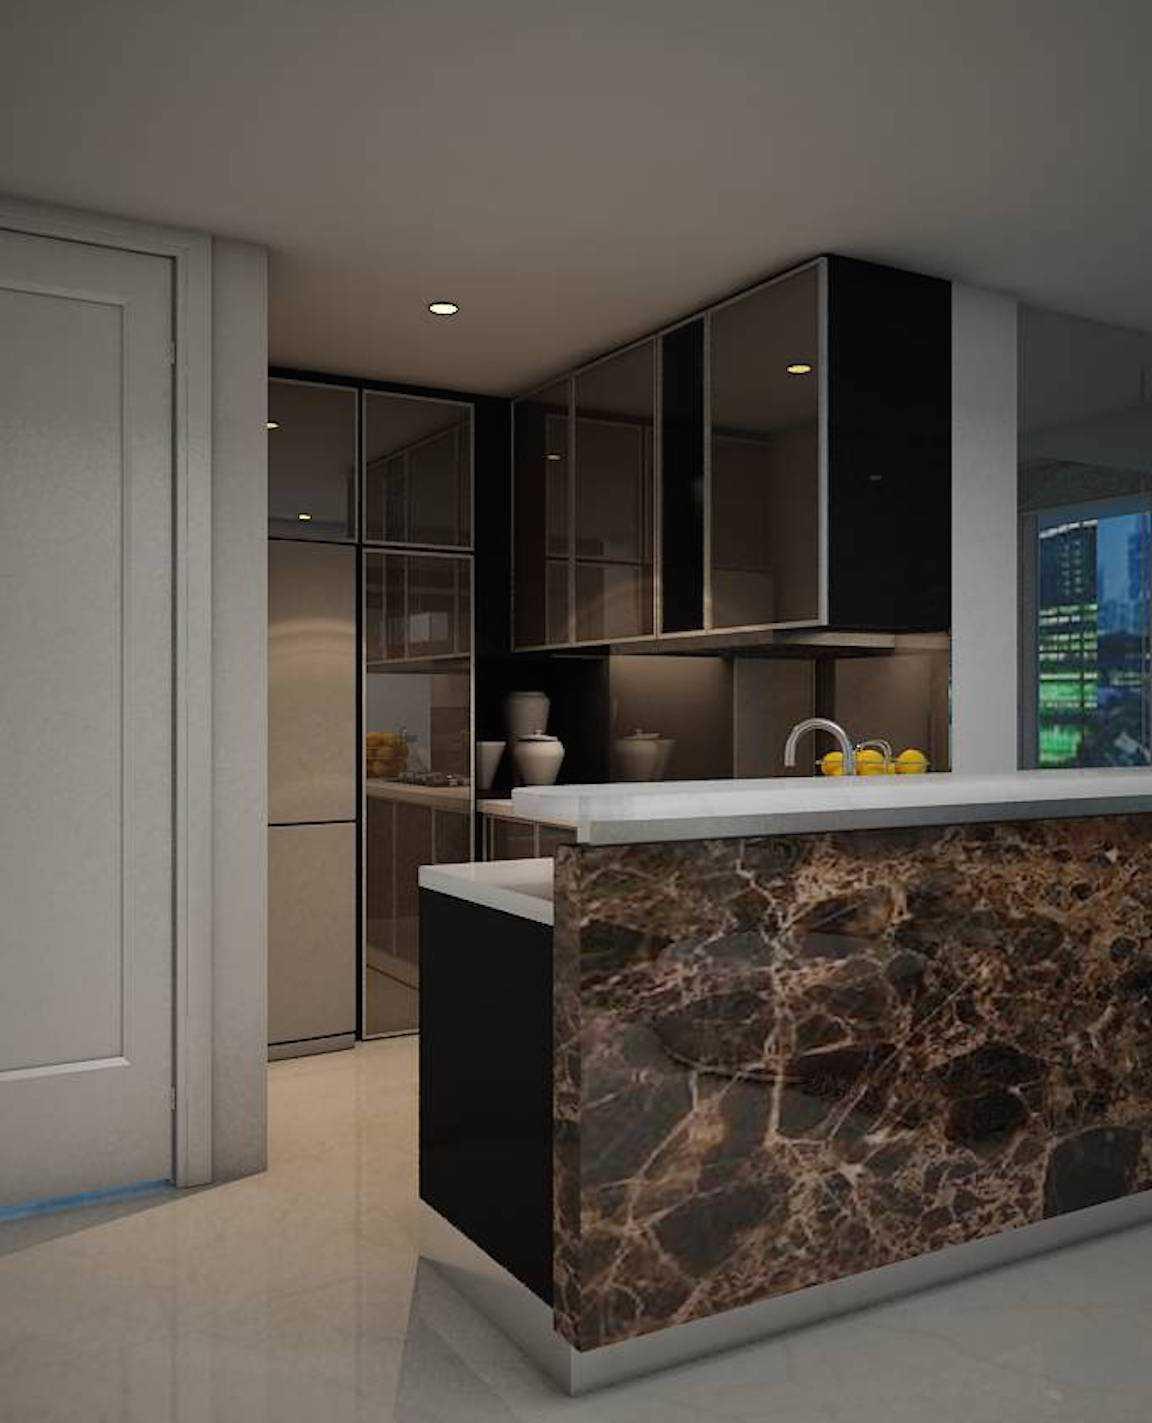 Foto inspirasi ide desain dapur minimalis Pantry oleh Expo Tje. AA.AA.BSC.BA.MA di Arsitag